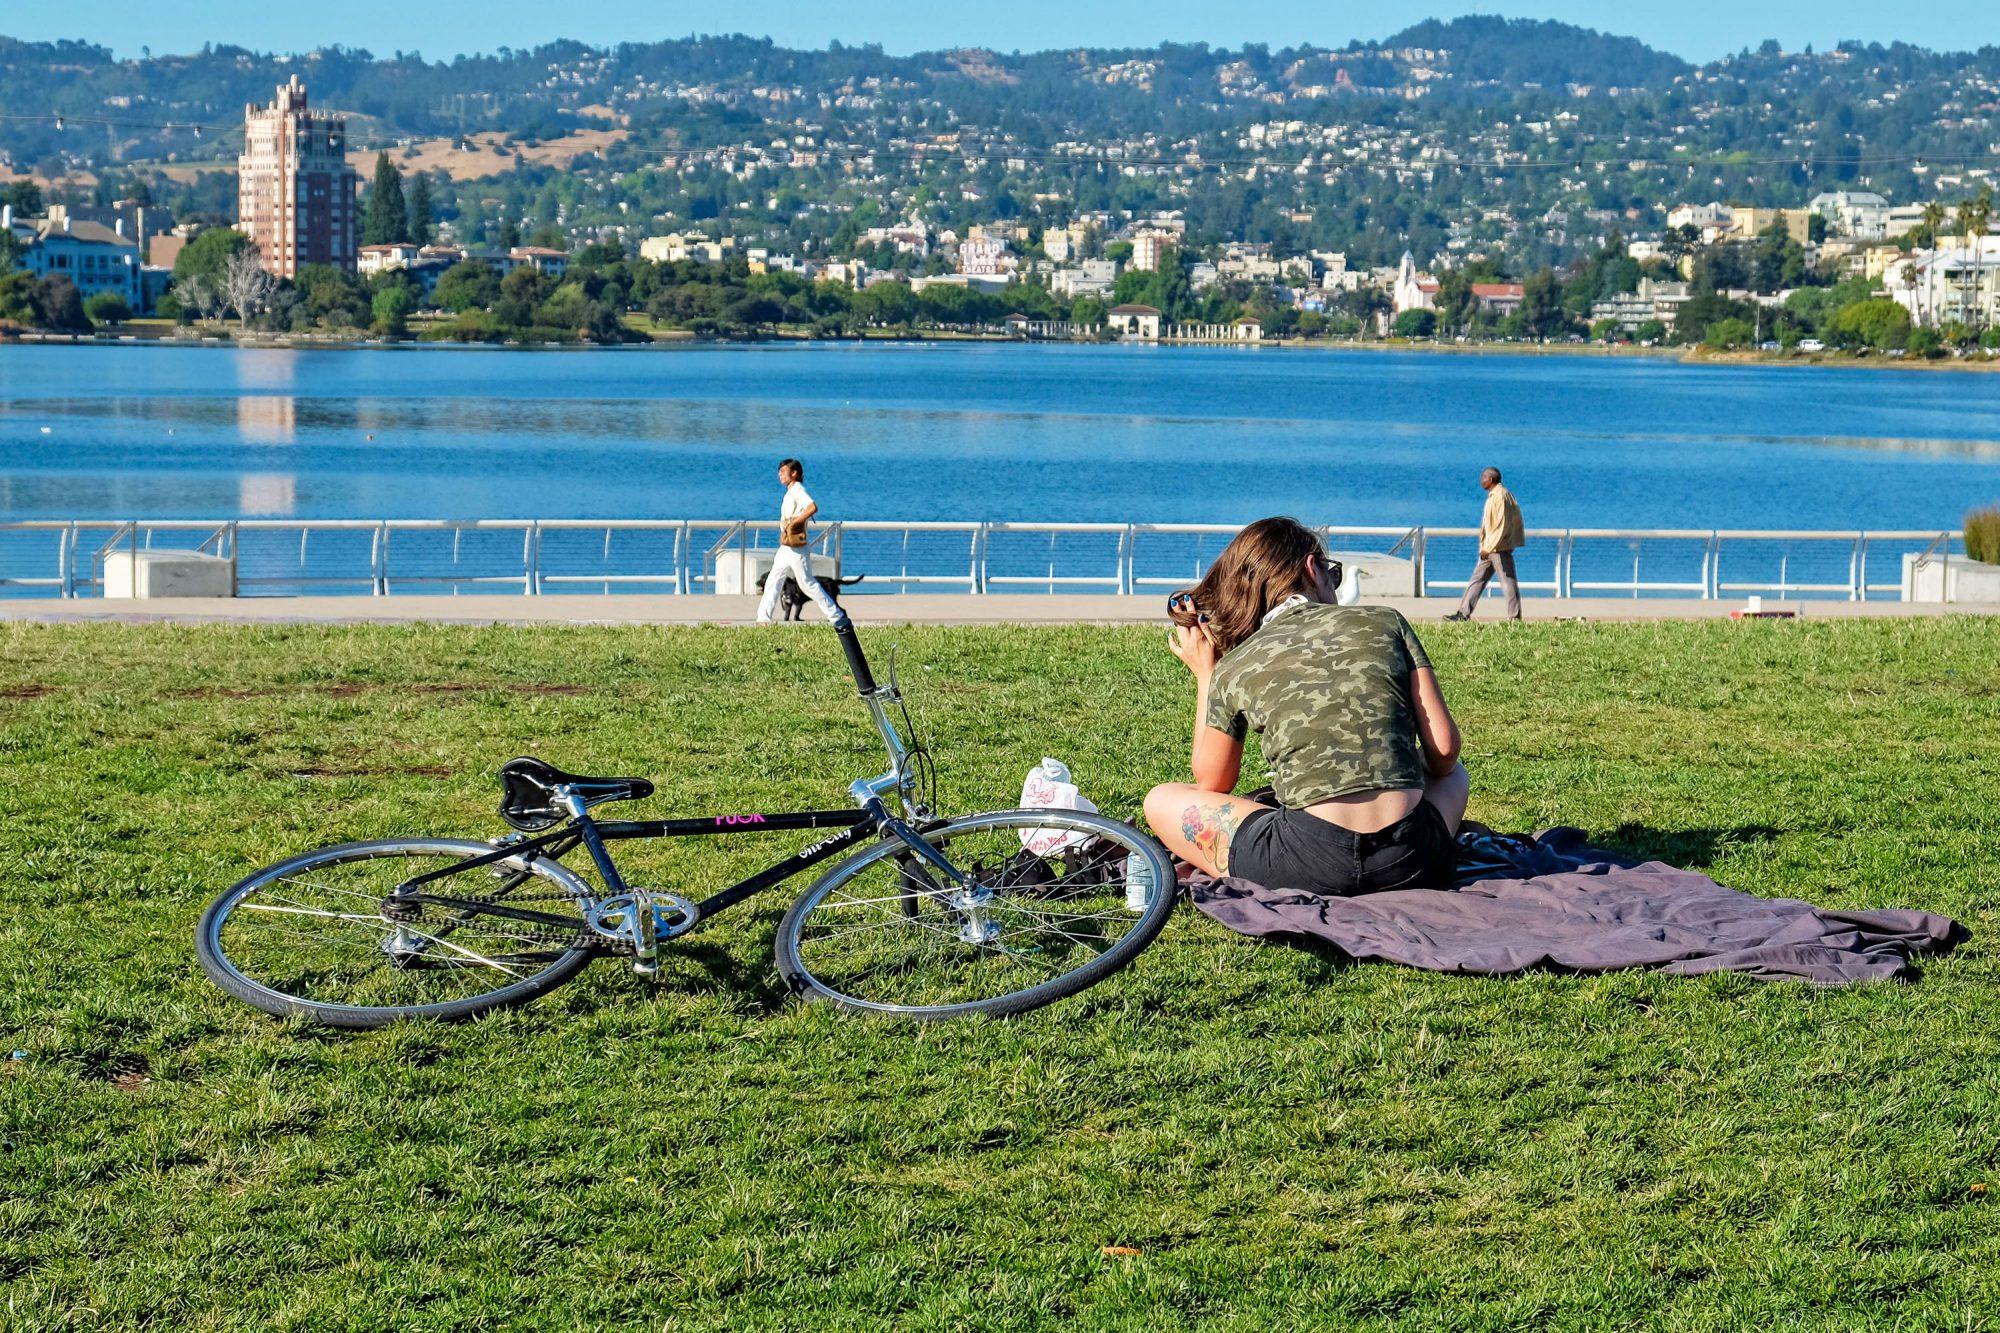 woman with bike at lake merritt